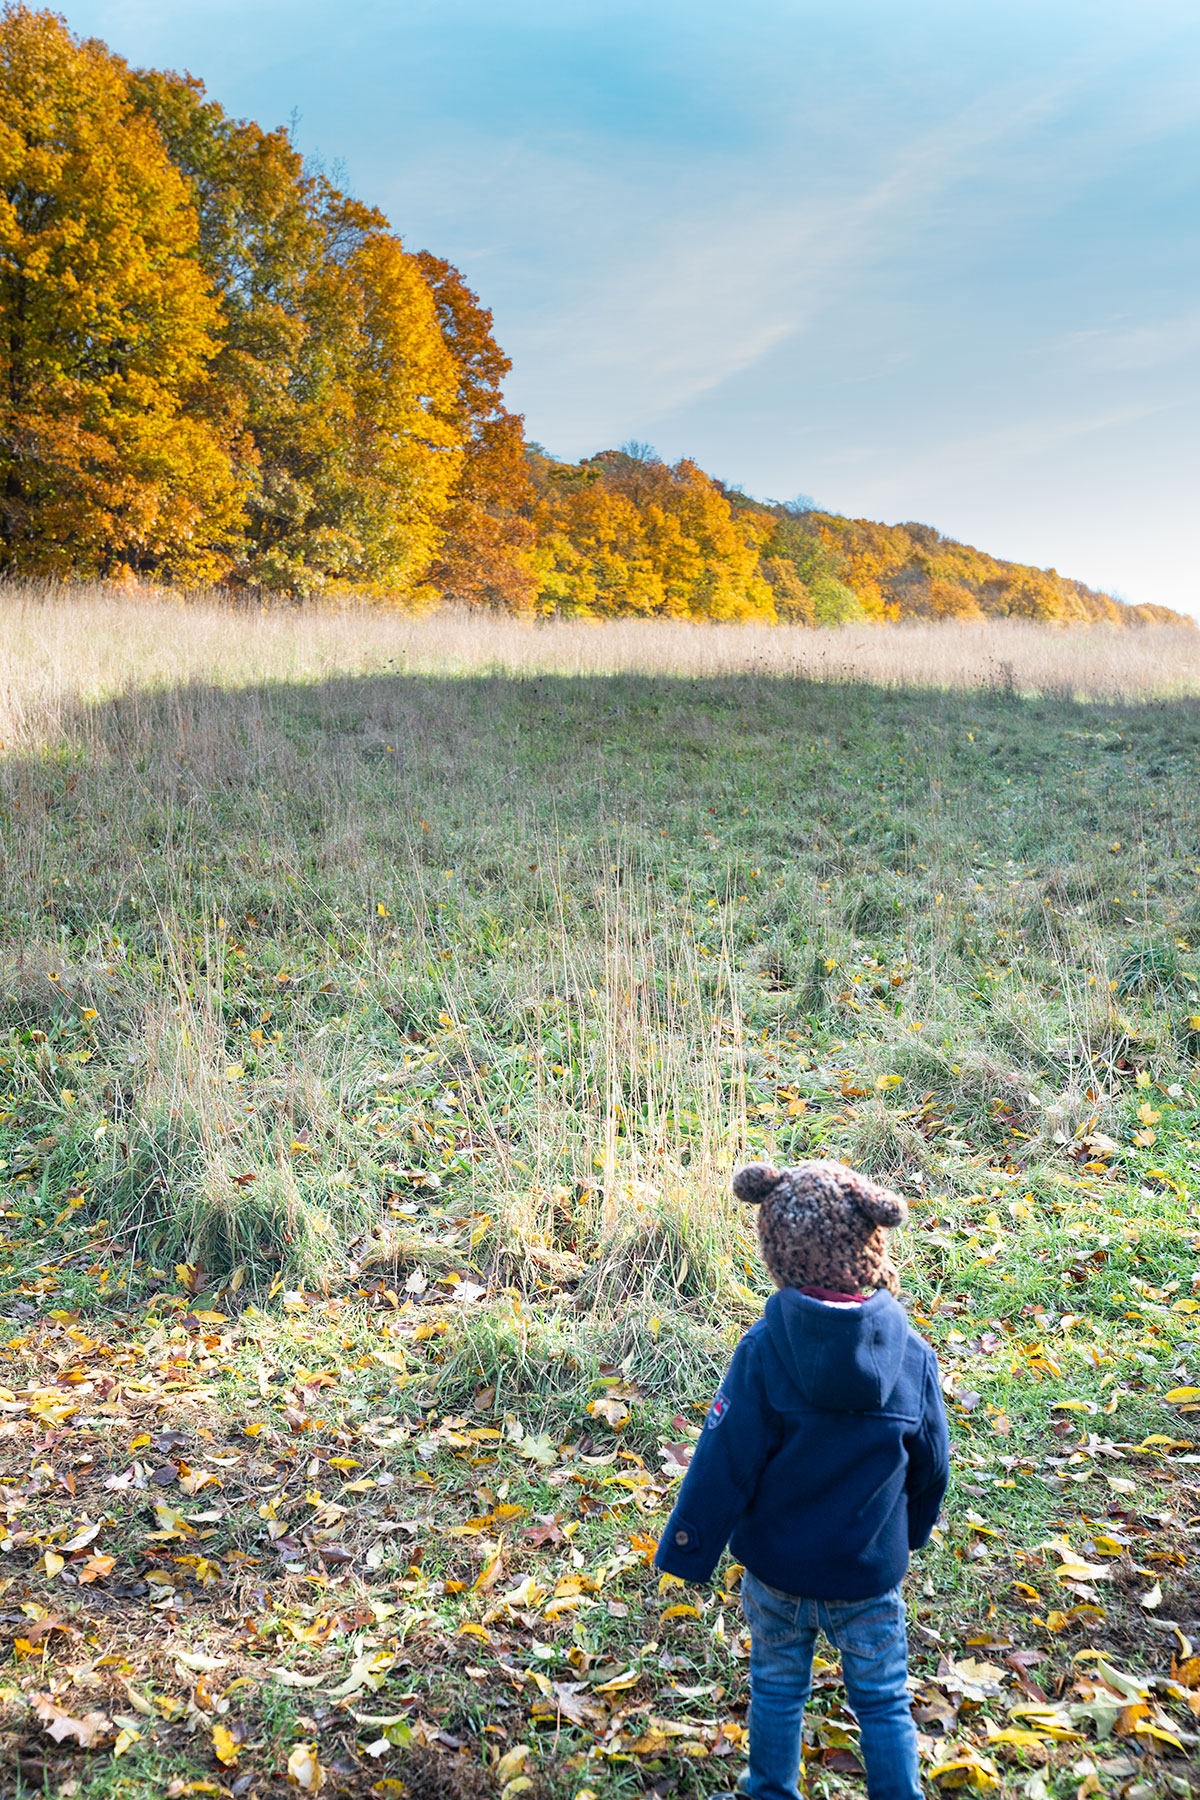 Beautiful-Fall-Foliage-at-Old-Town-Hill-Newbury